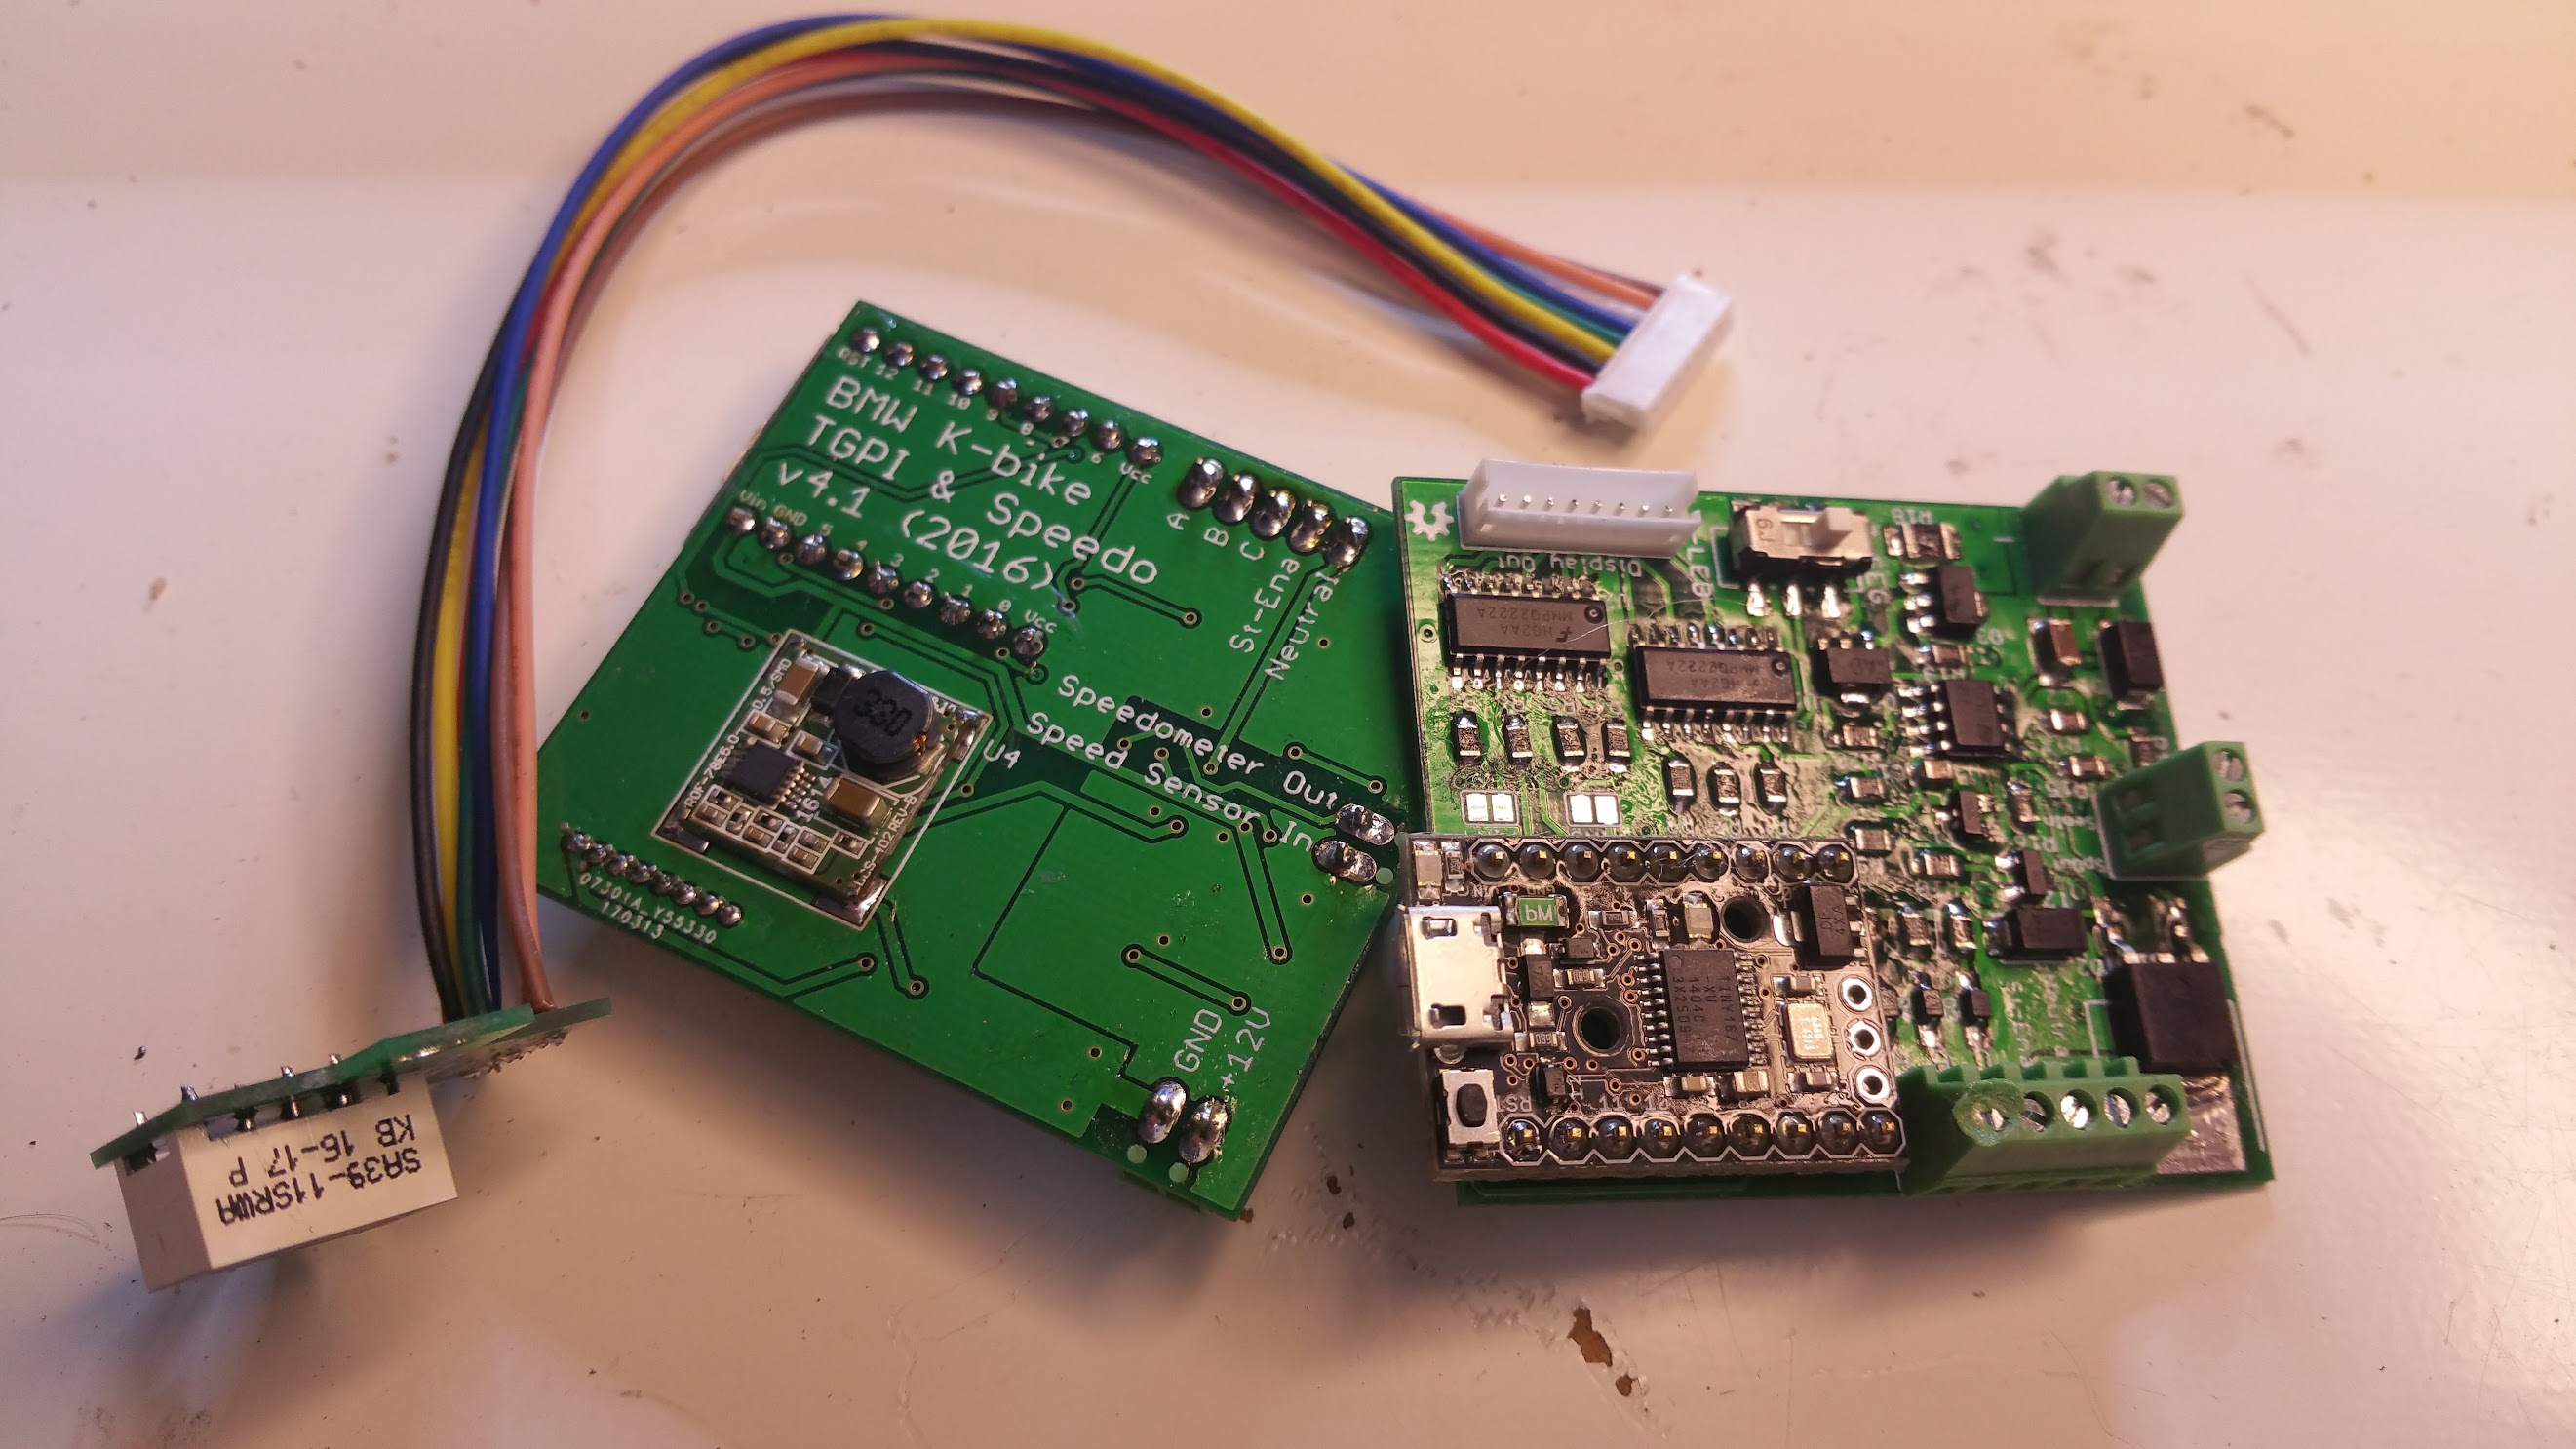 Gear Indicator for Aftermarket Speedometer (and other circuits) GPiQ6Ru0QZX5Jl2GBoXi66F1jeje-fDb5z54XcwqG11ZpMbLACSIGCMcuYyvU4yT7IMOkGB2XV0Z-_2PXobMt2Ap5Otd4MnqMjwKcRLoafHvHACPvuw7N740mZyGxJzNfMBSj_o04GpL_sJTEtw0_qsdXC1OiZbJThZeg0M34aGEmqzW7sza-kvJy4Mdo-SzBJ_AcMjIEvnqUcwHAUpWjSB35NnU01v0uSsjW499rddlYA7GjUTDlm4PGZKKh797cnXeuiDXCRFiwo2gNrb-UahWCDTxHCYzz1aNUNshHAfv2K7O2mzfXOtfHgMHKSQlHiN3sWs7hIVxYsMOZb8vZJBMR0-Ch1T3s3PJMXcVfY1LbrFDV5c_HackMAYREjHb4k5i_JmLo5nZcLtlOoz2_gkJbf32wH1GRnpVvzHZoG3KkQmRsiTA9uXZkz_f-WrRJAgxybKWMWLPmWtghFeN2-1ds2OKddi4tNvLOqw3wIUvgiKZGvCzXbXUqFBKyP5M6-UPx00Md9HyU5p4yG4hU6FFStaX7fsiqWG6vmLp0flqnNauhjz1fZkj8CK8LWL_AueV5TBV-69Kf_eCsLSXZW0sAkh5aeI1pq0rRNkK66FSn-nAGbYOT-hM1QcAIQmM_N8wyx4LxUDyF8doMyg4OIP6mqzGueKfbhp818MCEw=w2642-h1486-no